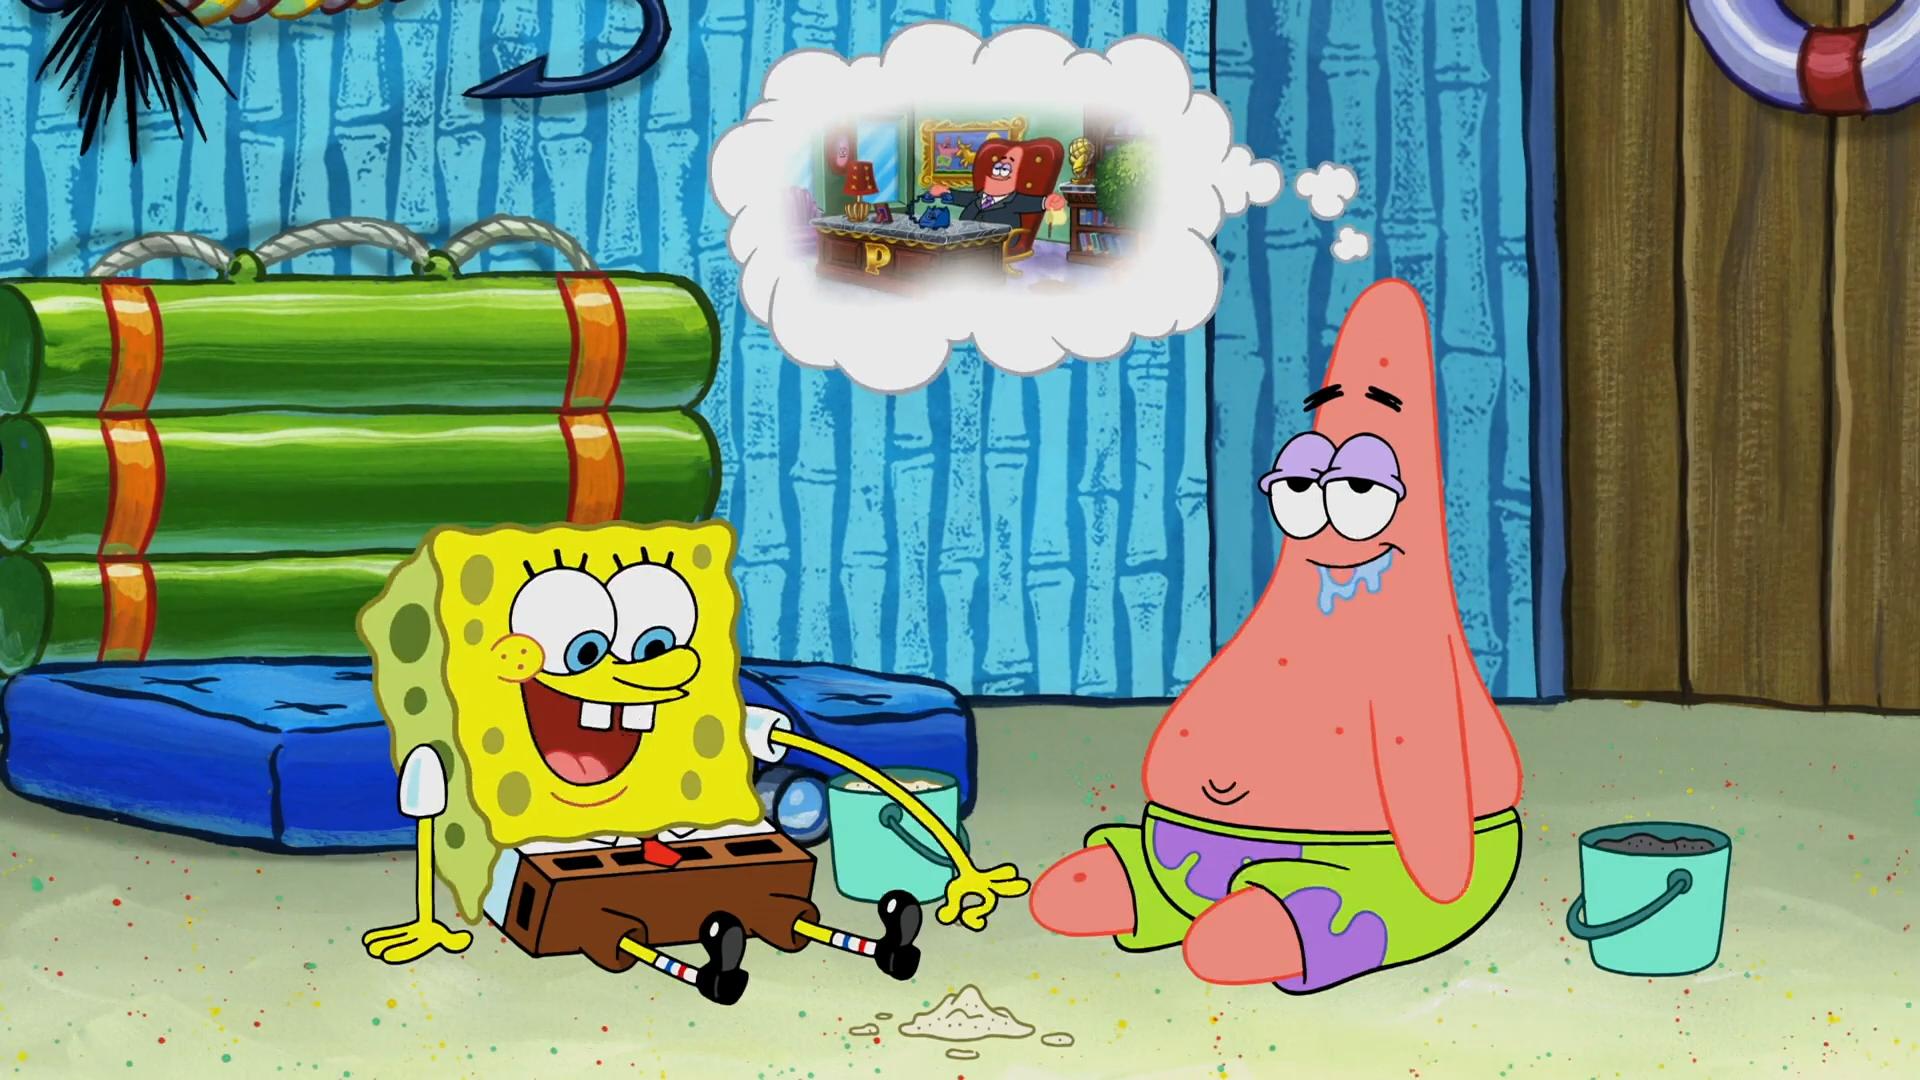 Patrick Corp